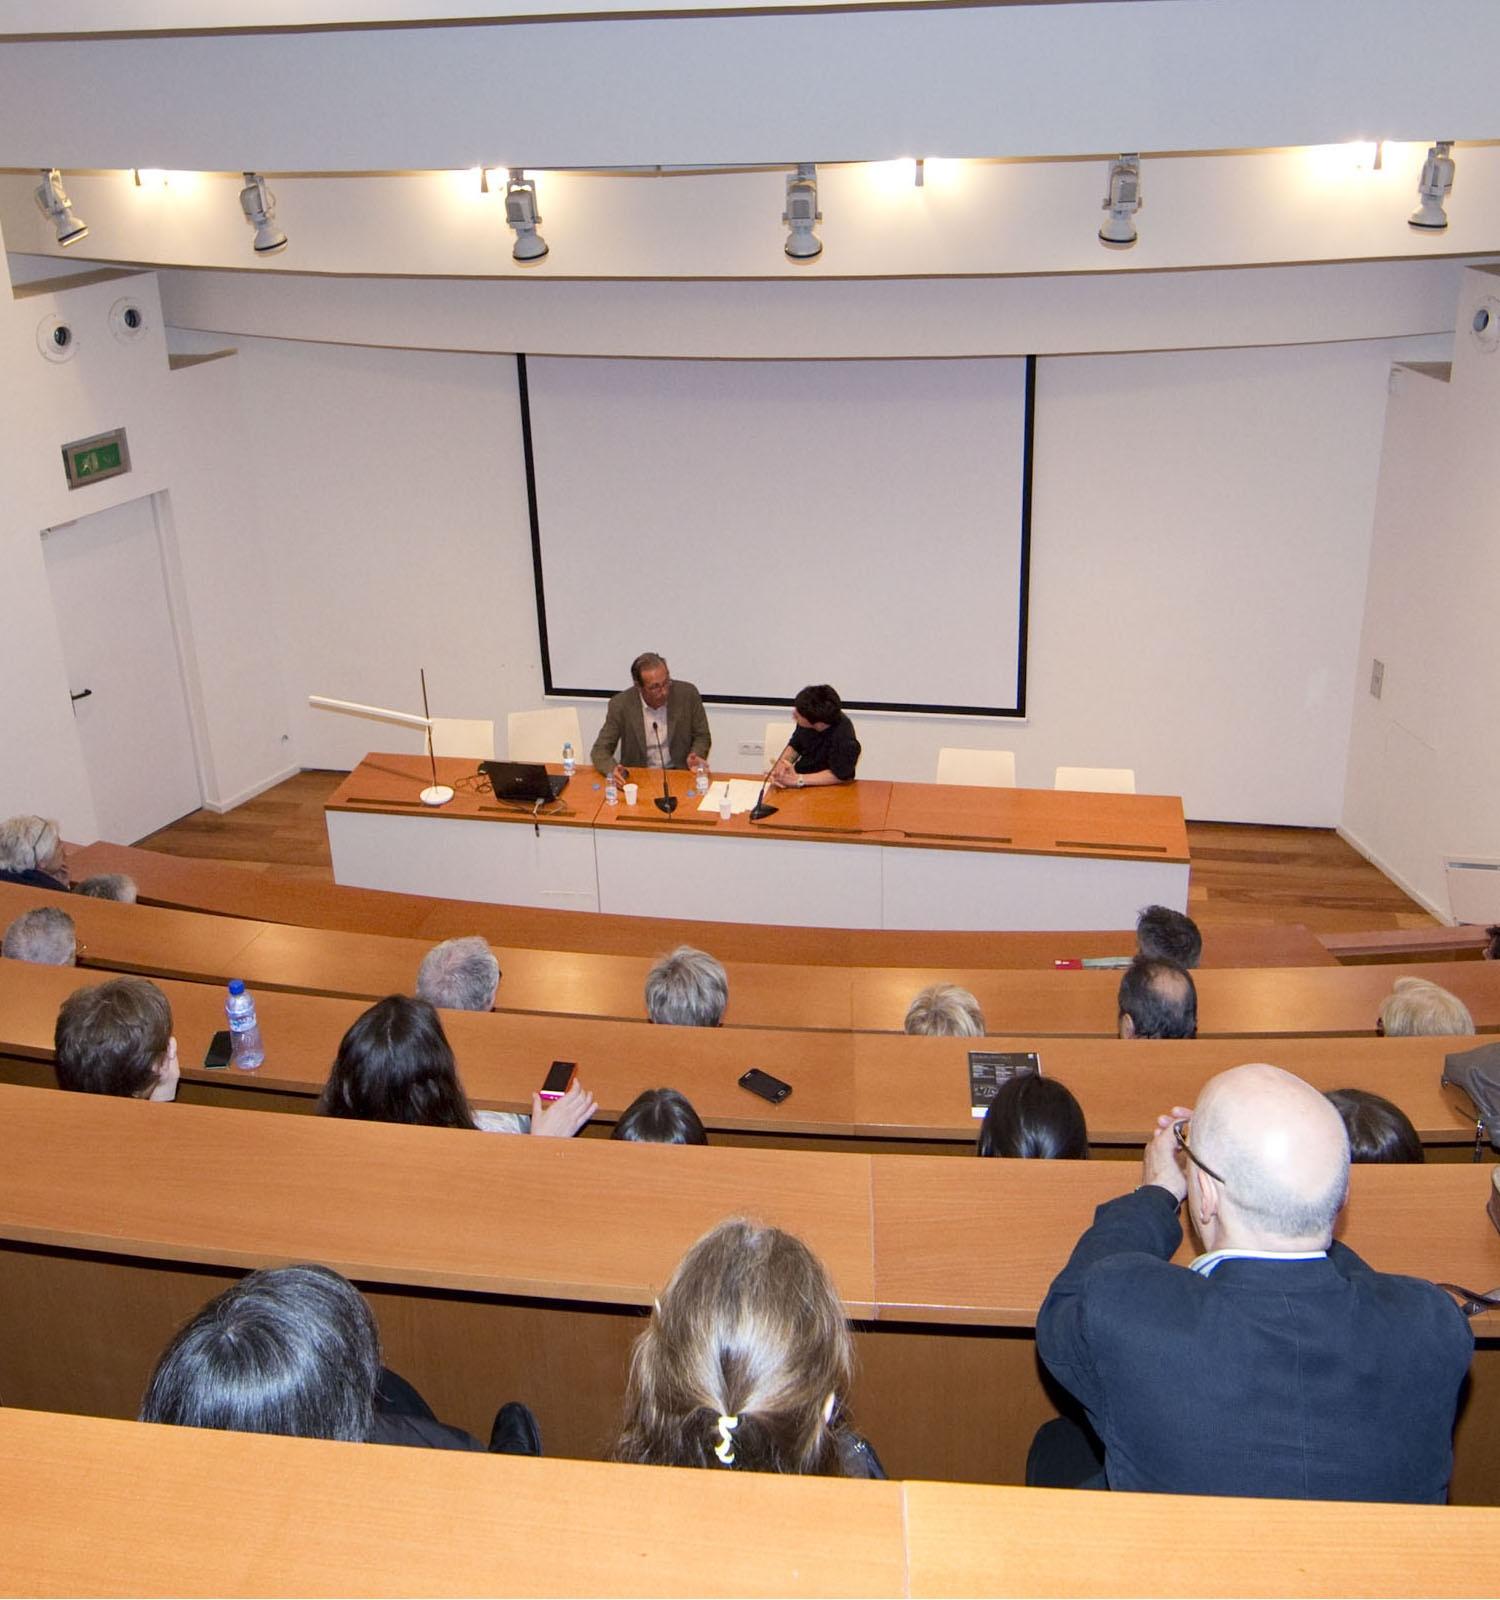 Josep Tapiró i el seu univers orientalista